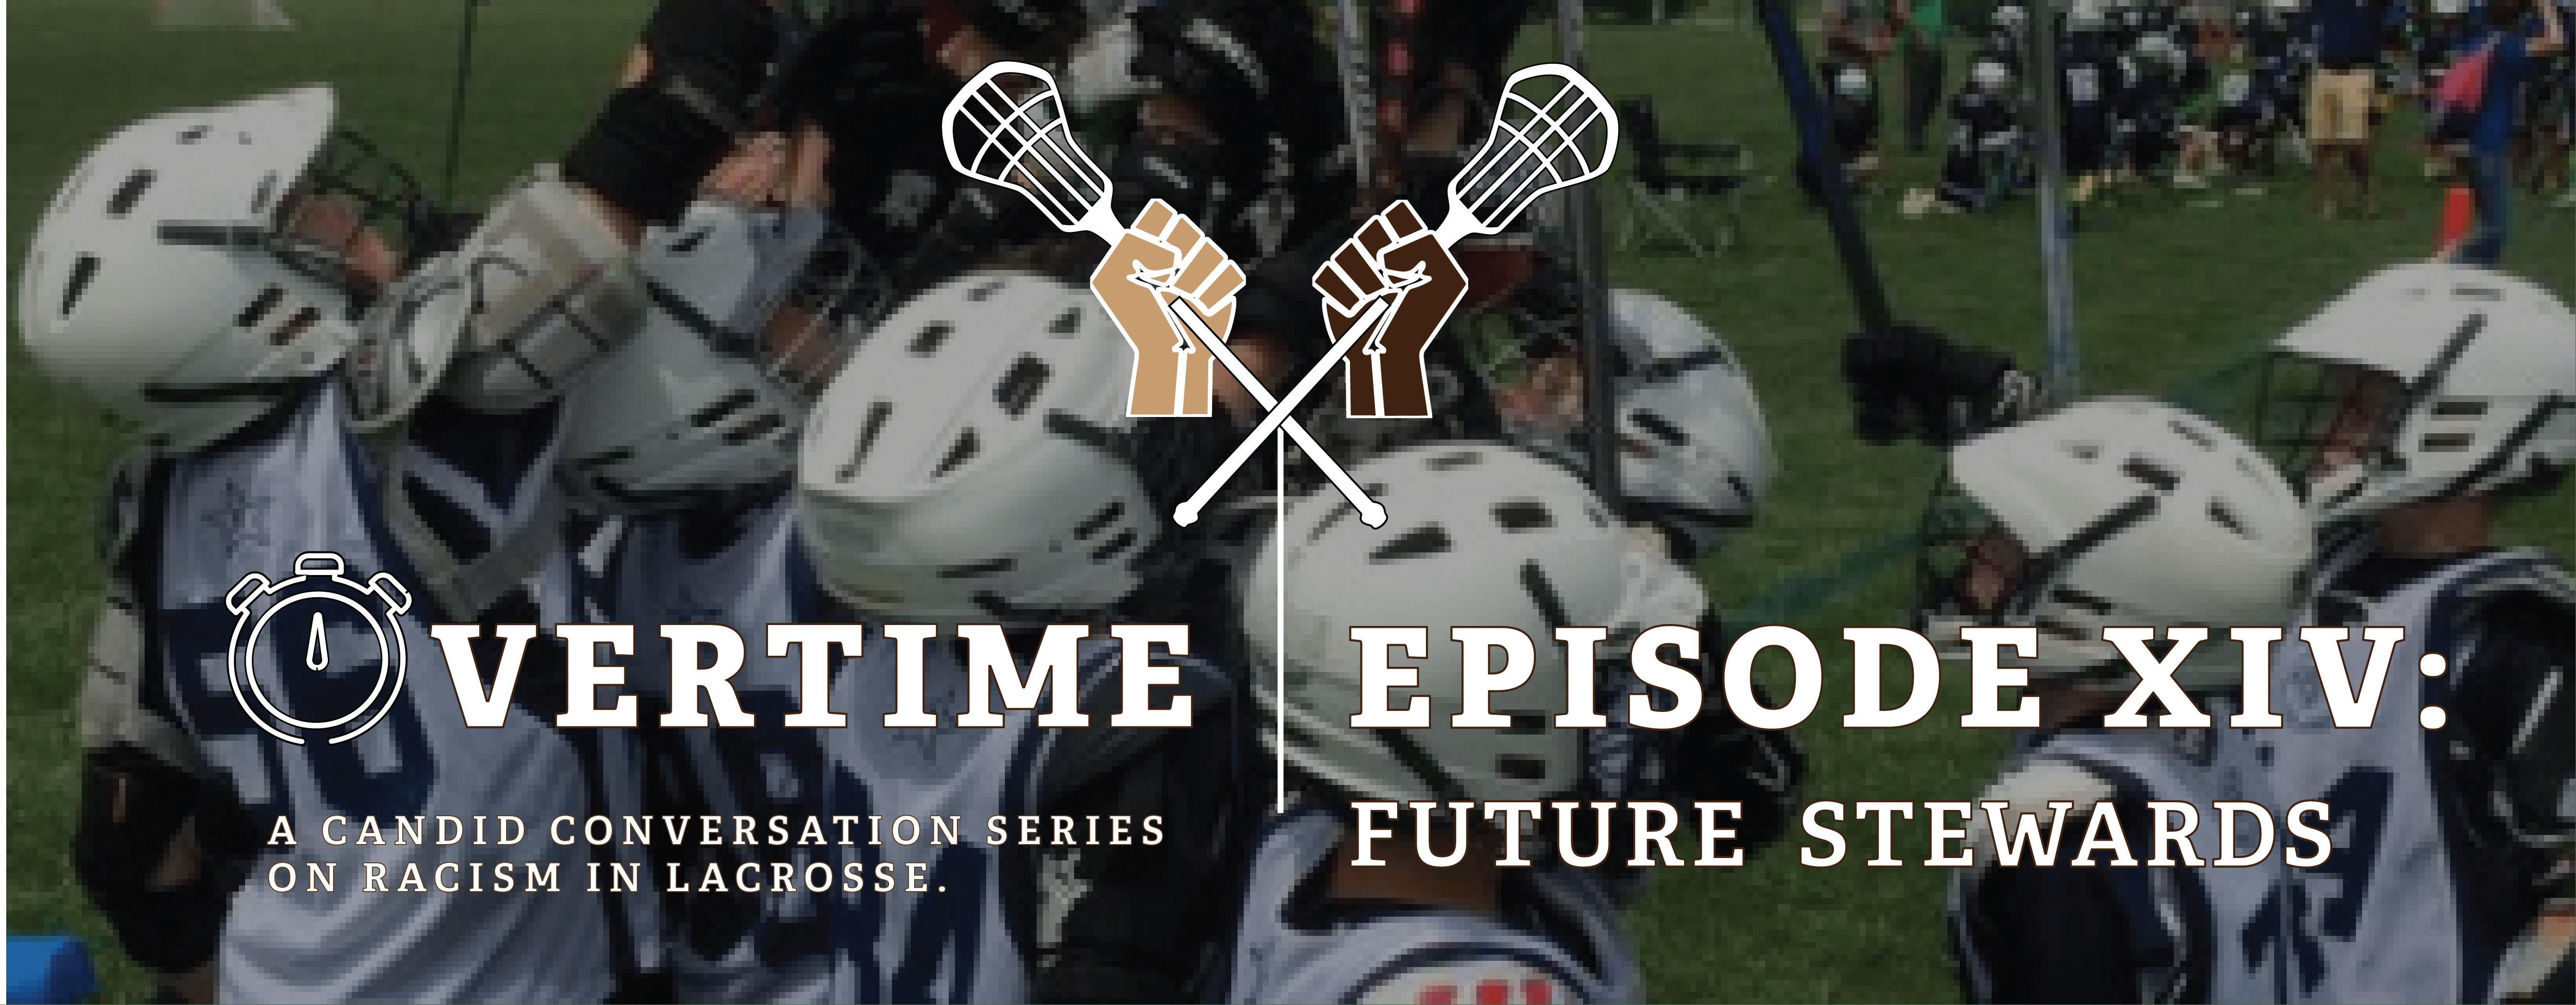 Overtime Episode 14 - Future Stewards